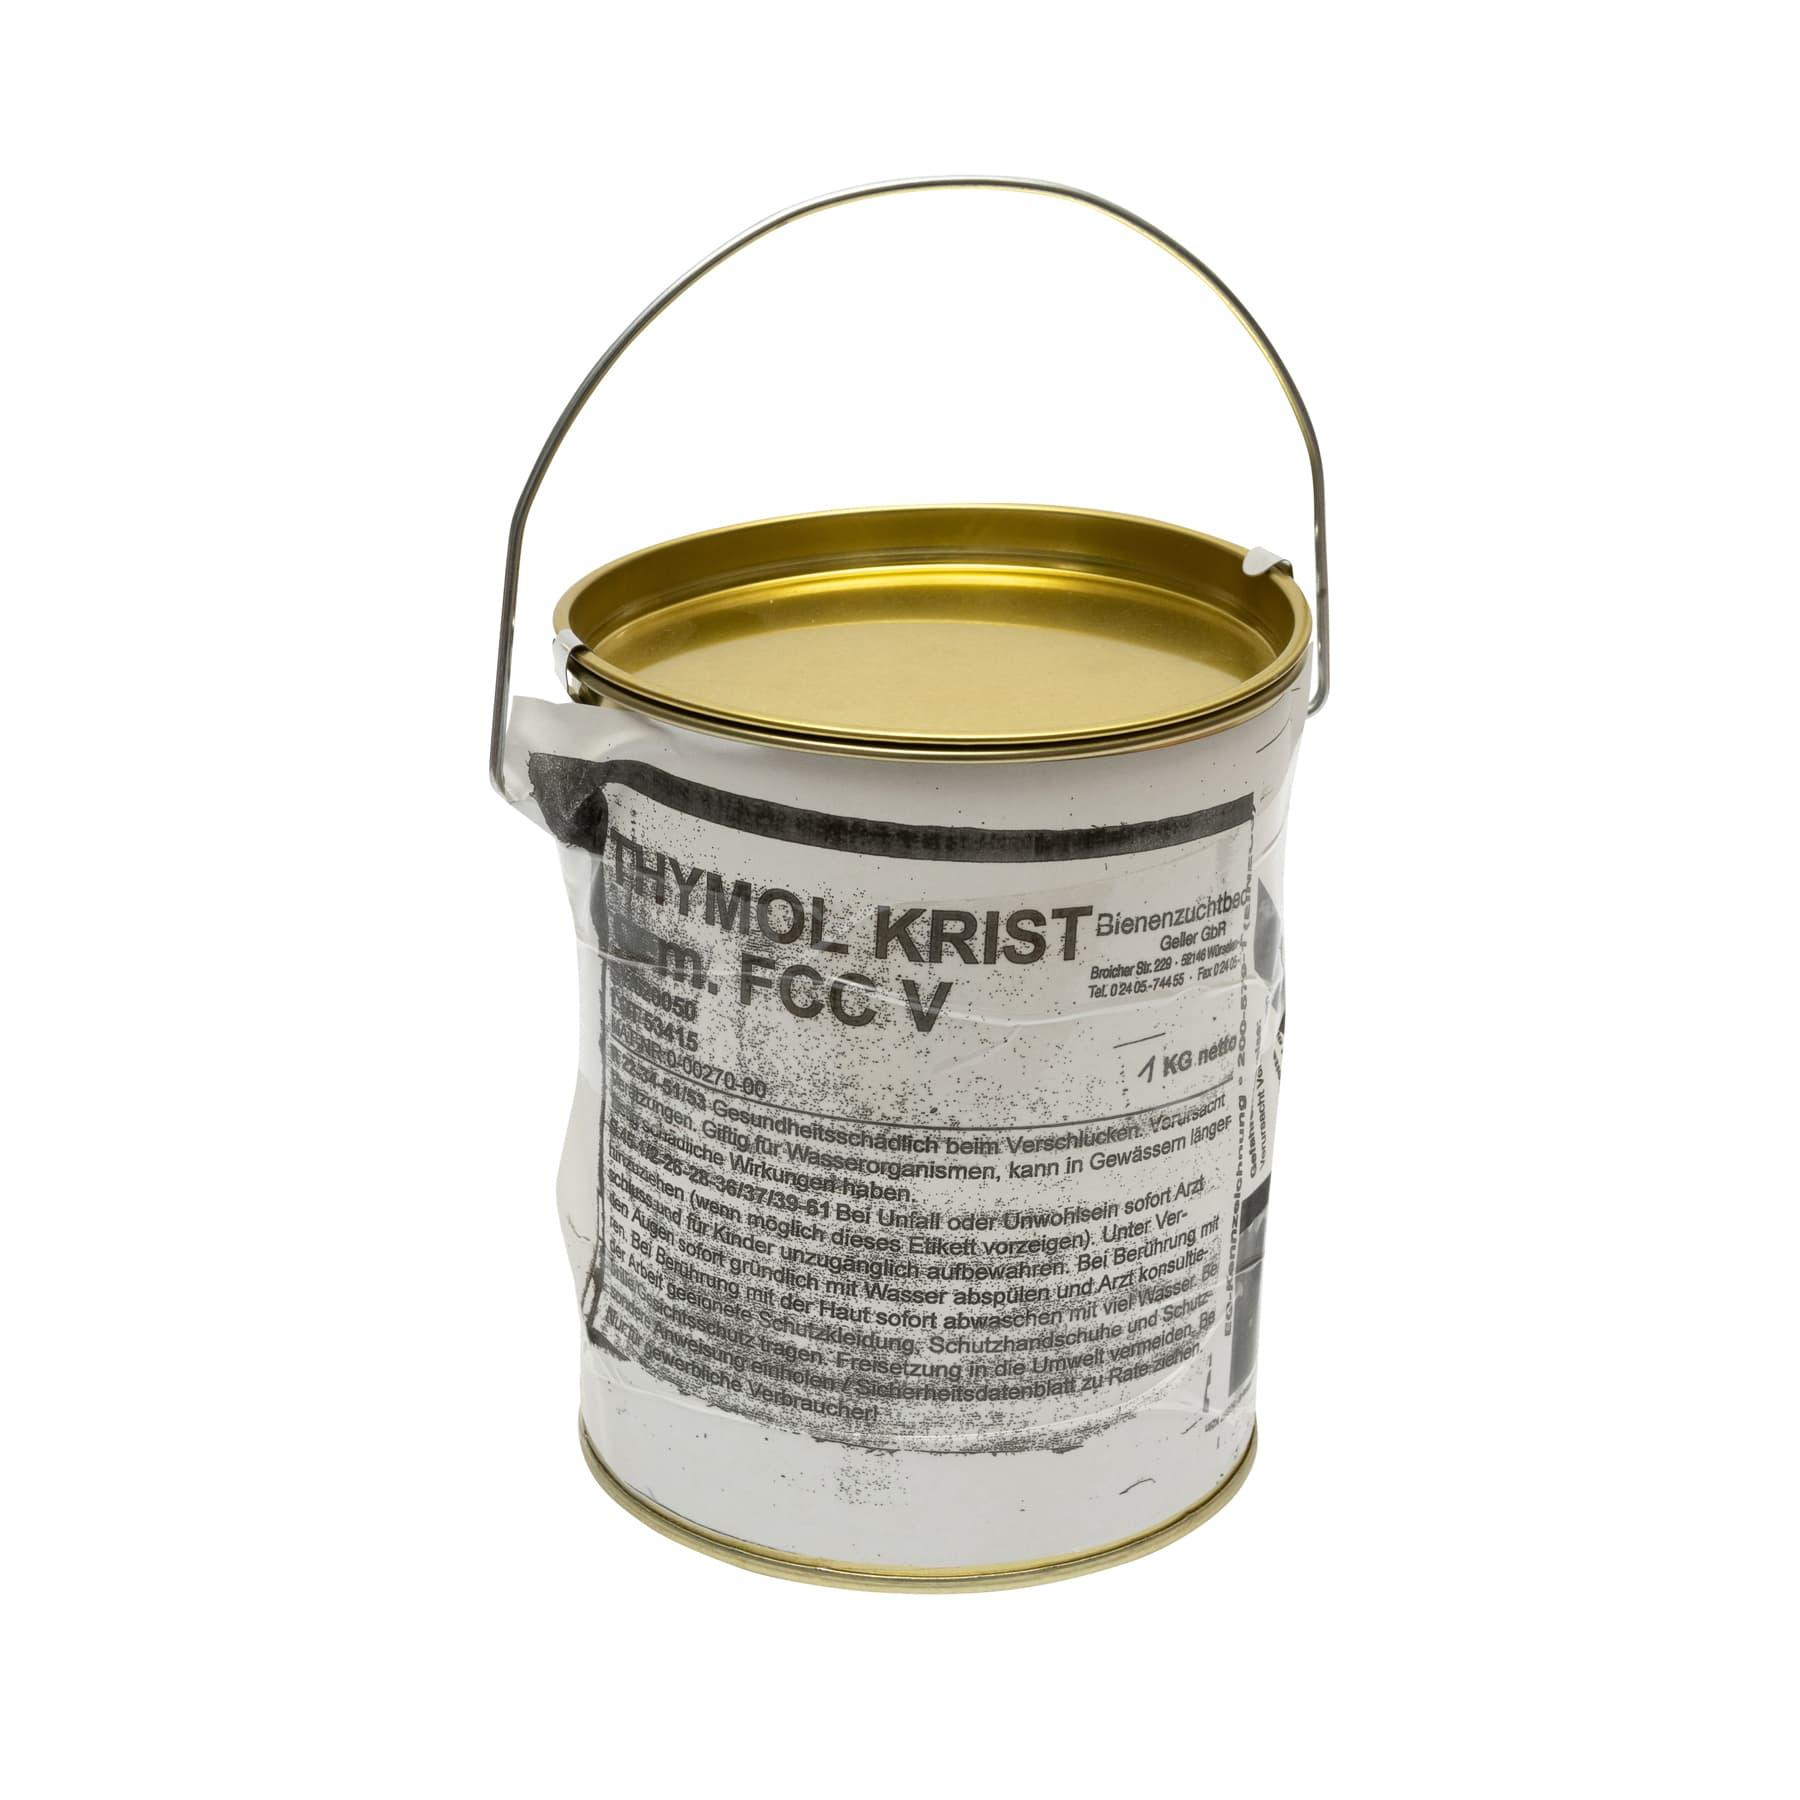 Thymol kristallin kg